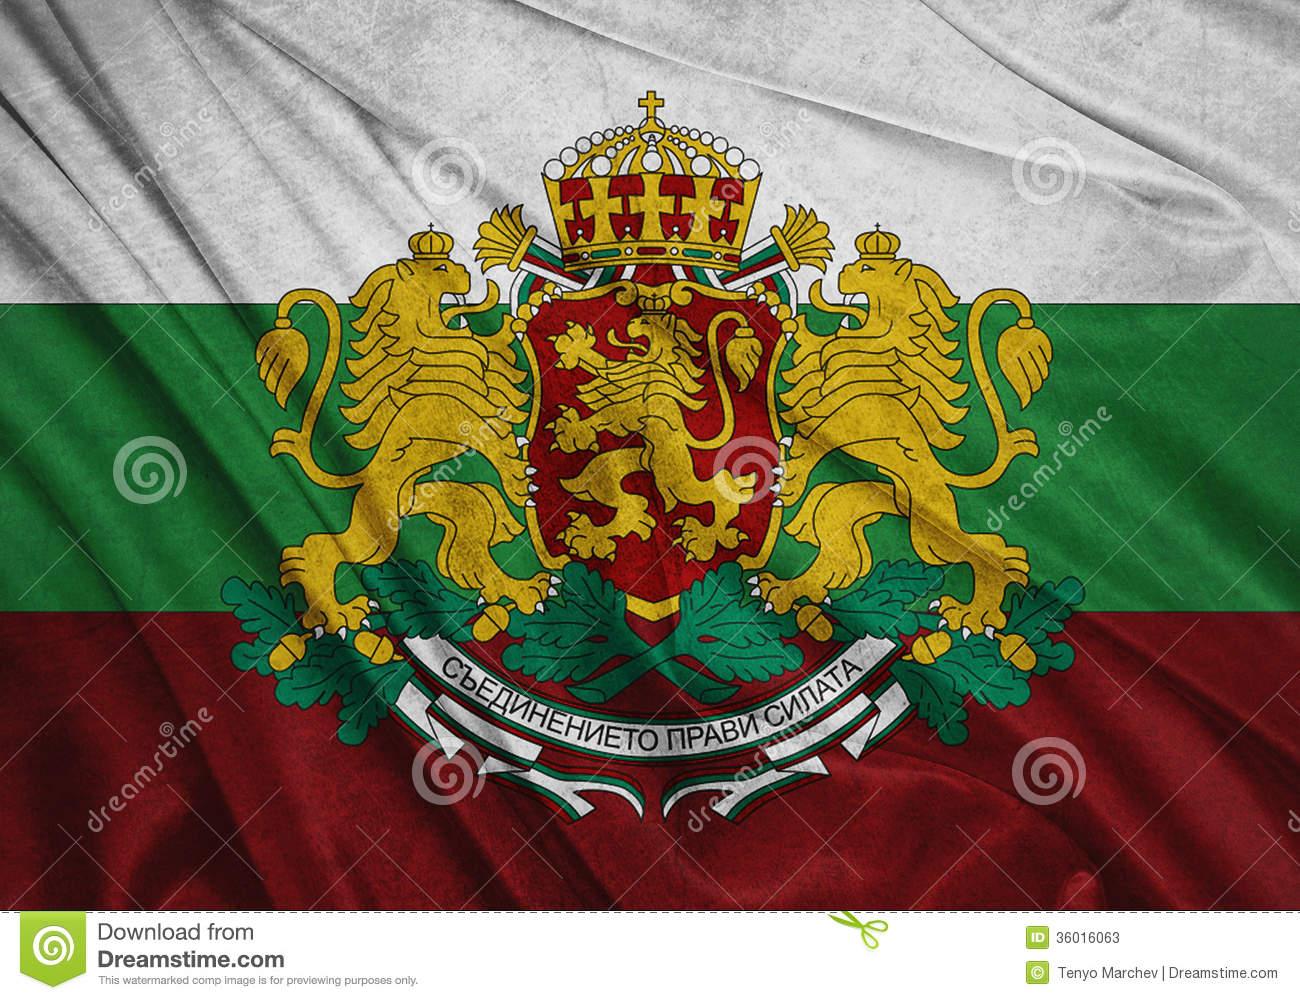 High Resolution Wallpaper | Flag Of Bulgaria 1300x1000 px